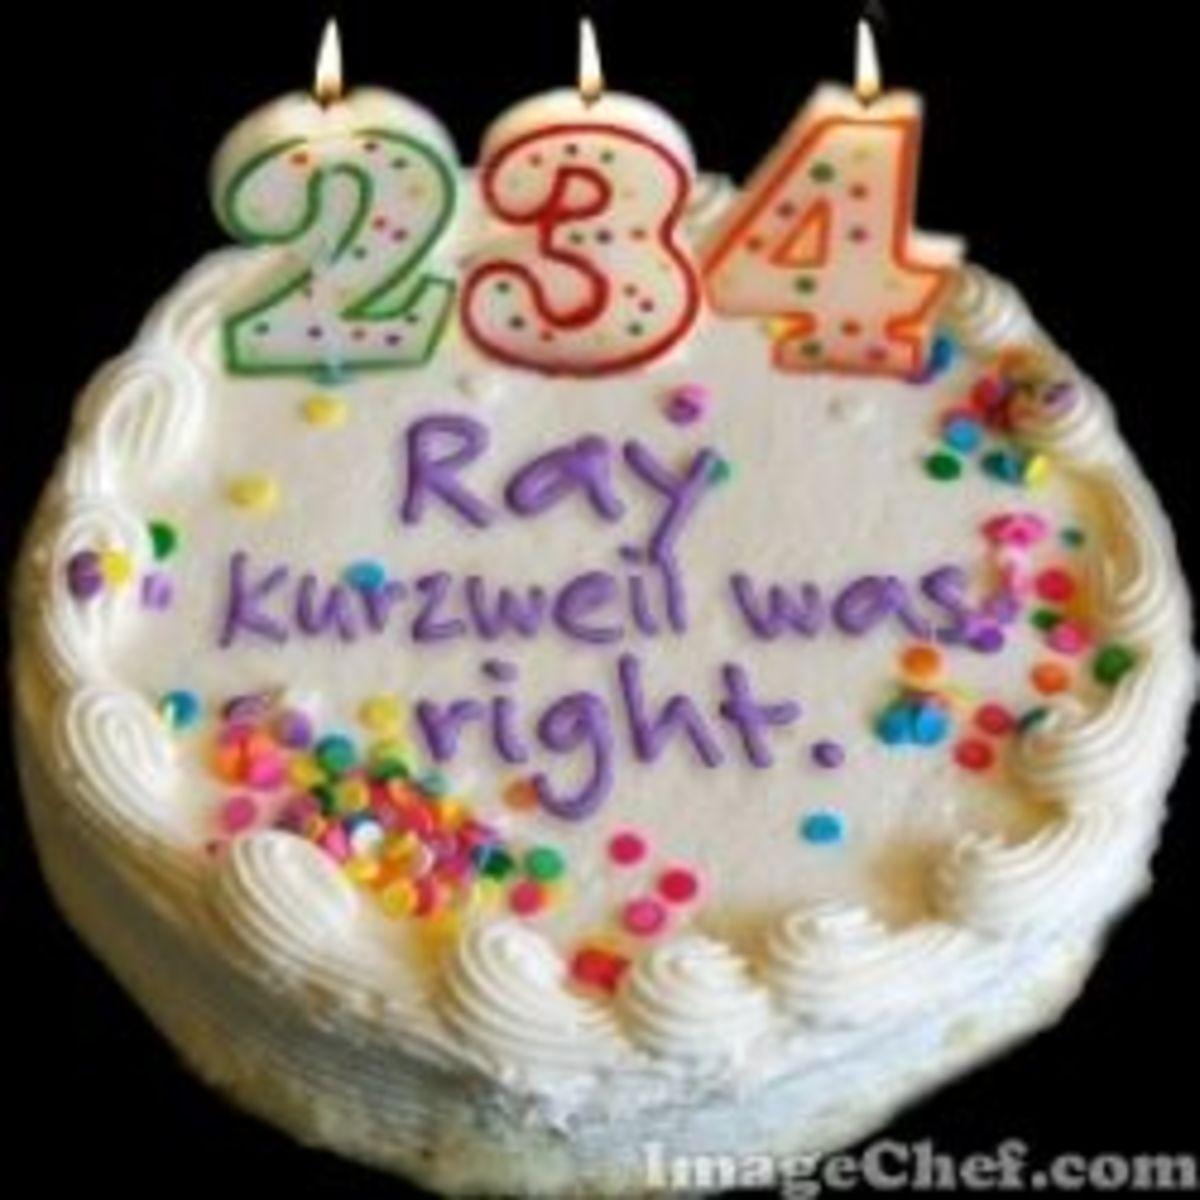 Ray Kurzweil was right